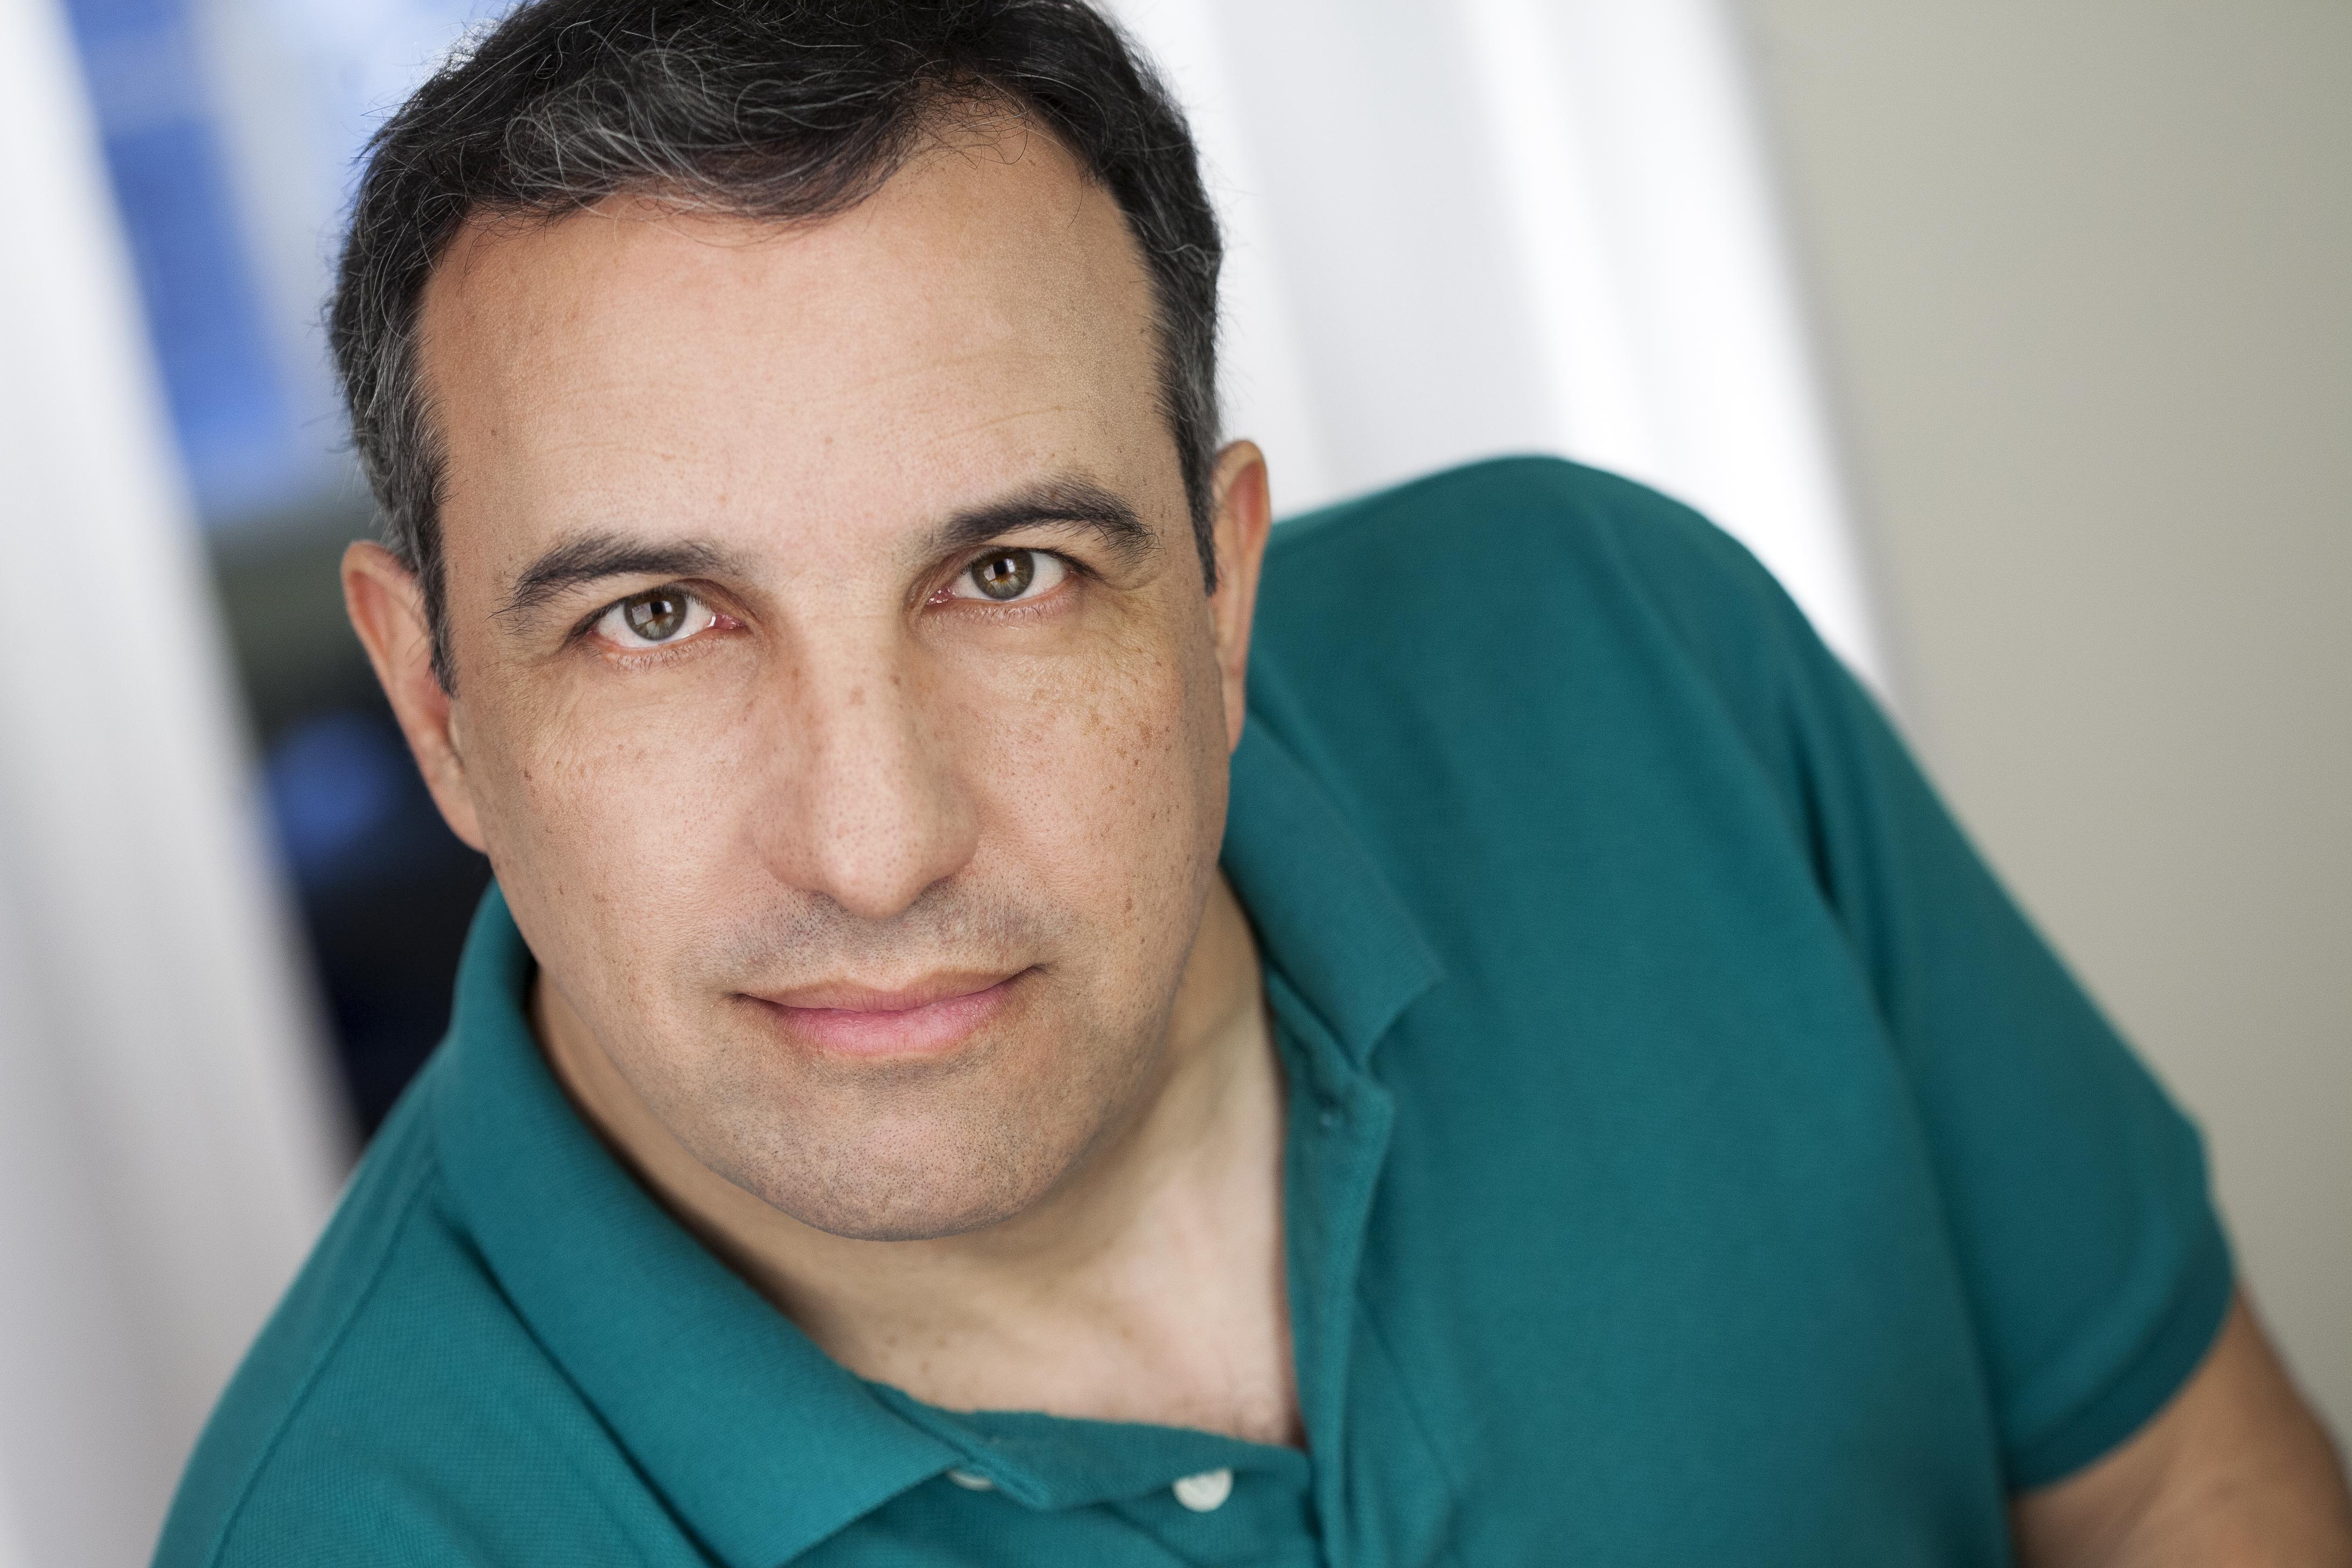 Tony Ruggieri